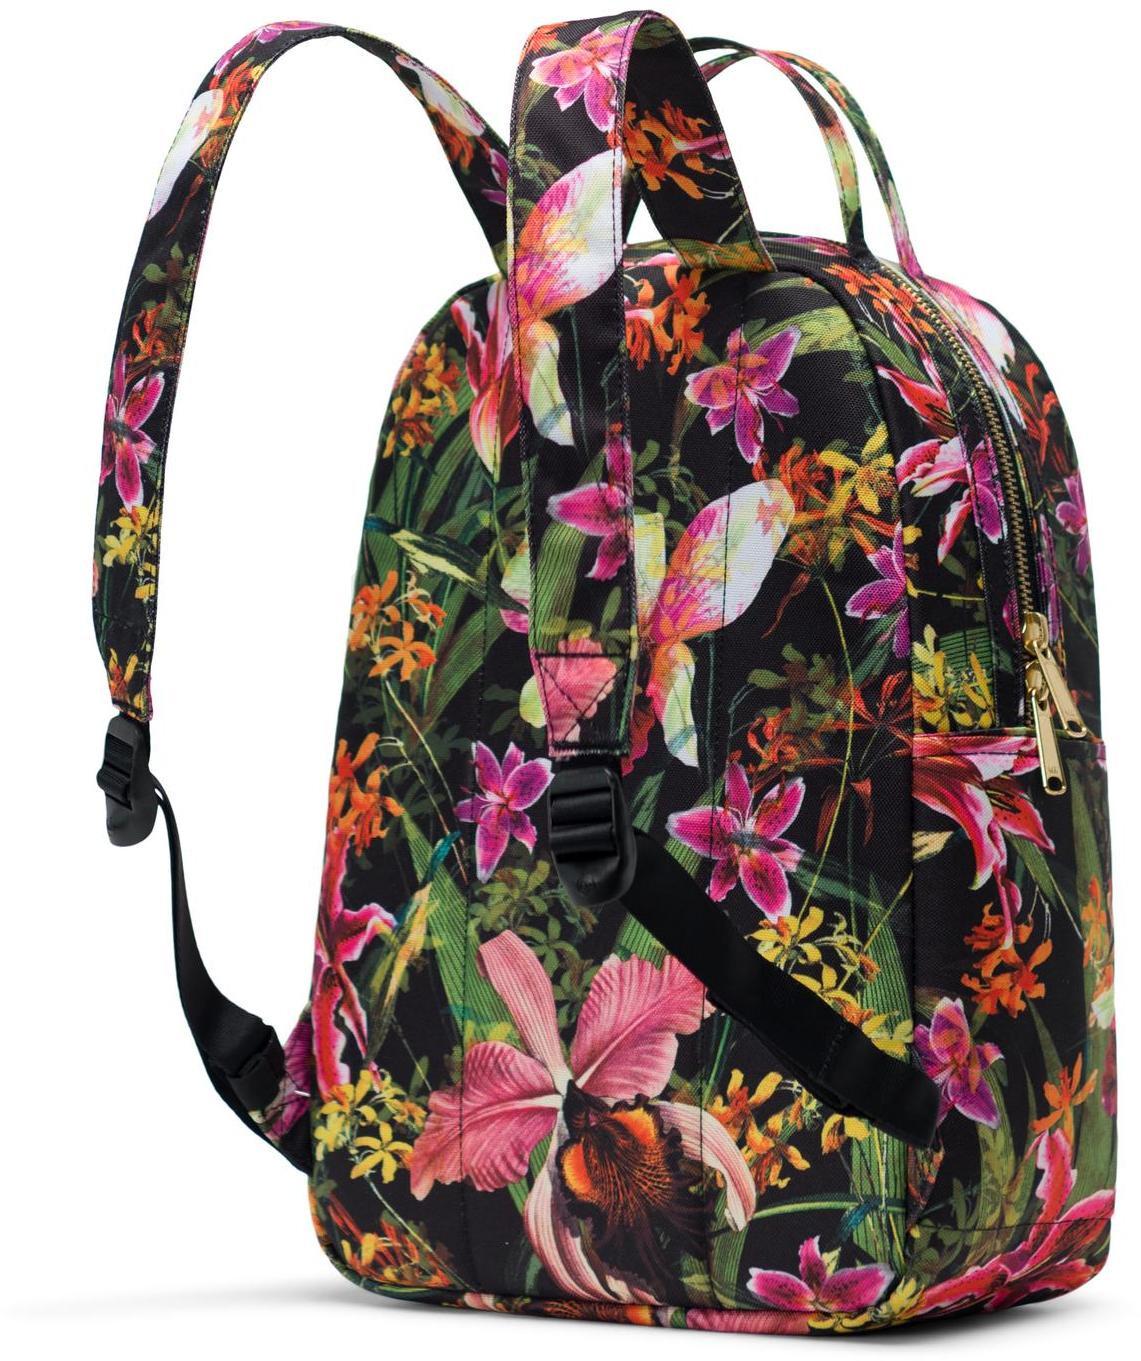 e01c49ee4d1af Herschel Nova Small Backpack 17L Unisex jungle hoffman at Addnature ...